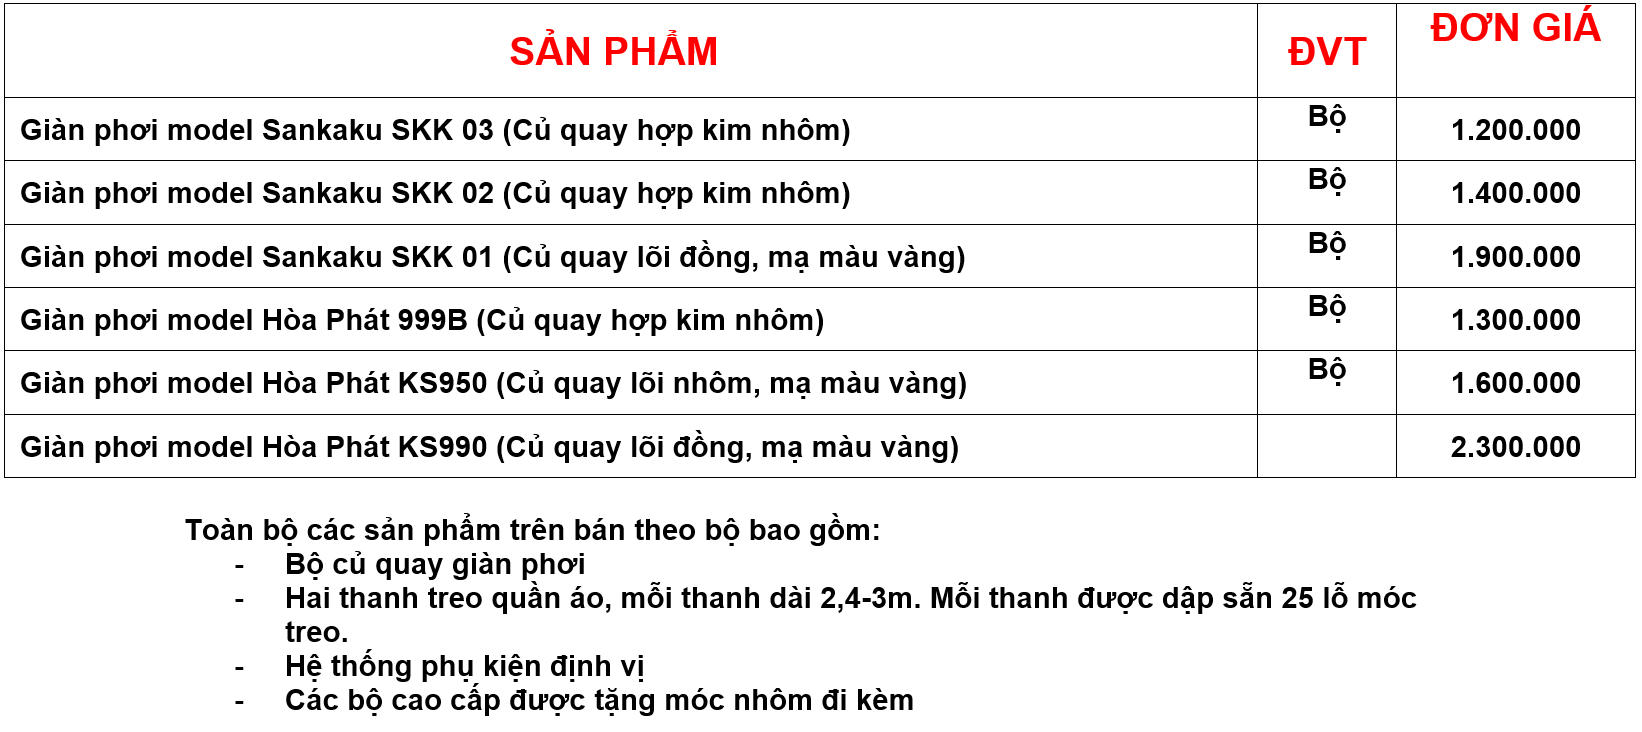 Bao gia cac san pham gian phoi thong minh cua cong ty TNHH Rem Cua Han Quoc